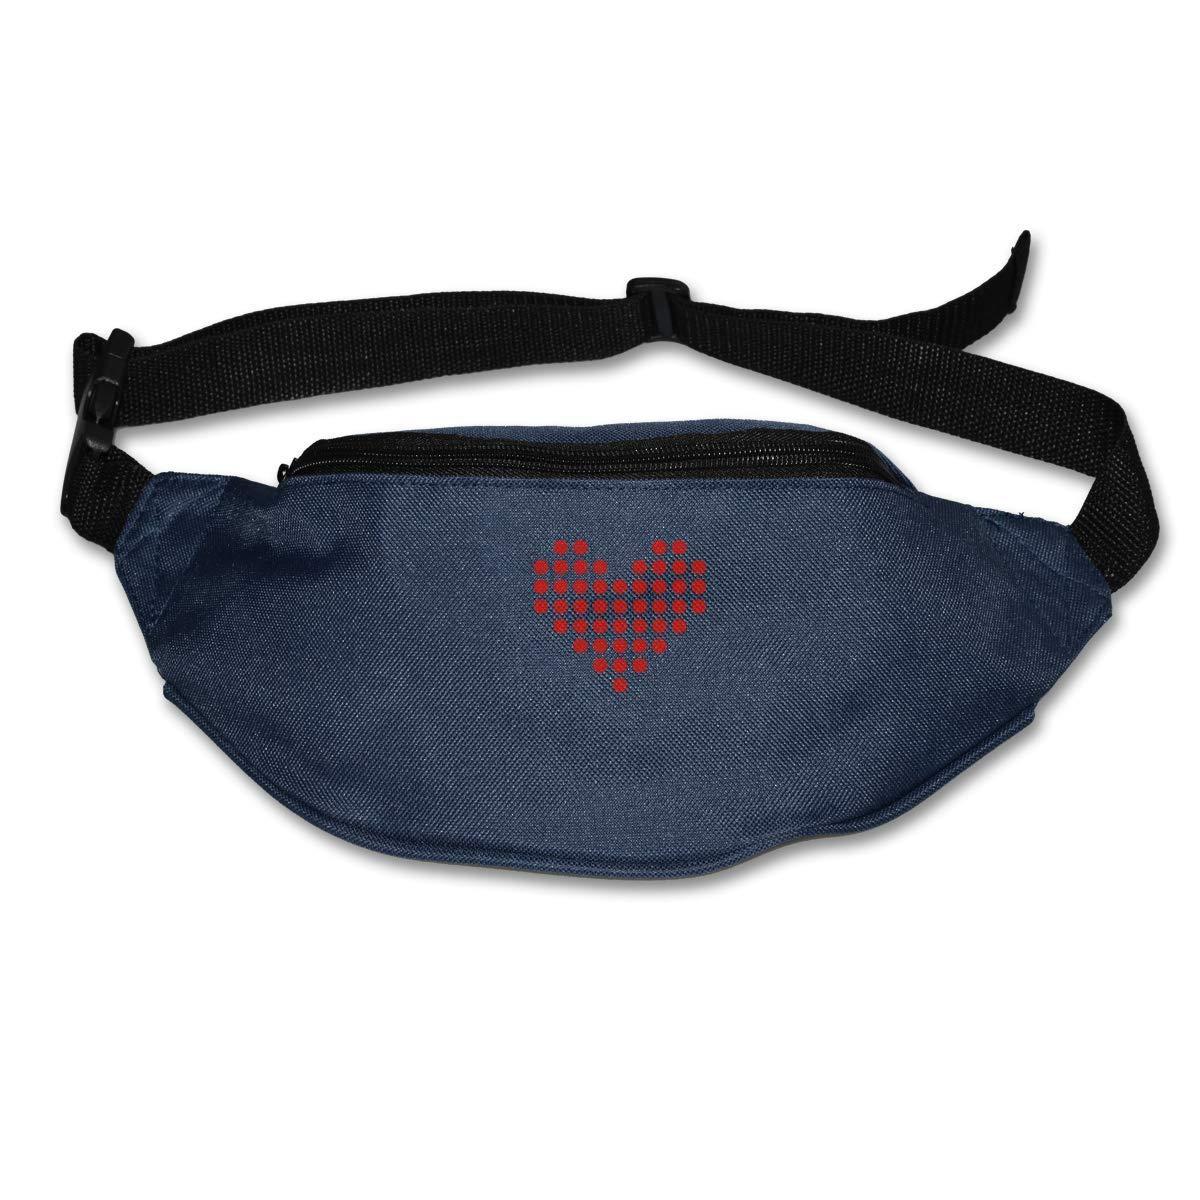 Novelty Colorful Cute Heart God Bless You Canvas Running Waist Pack Bag